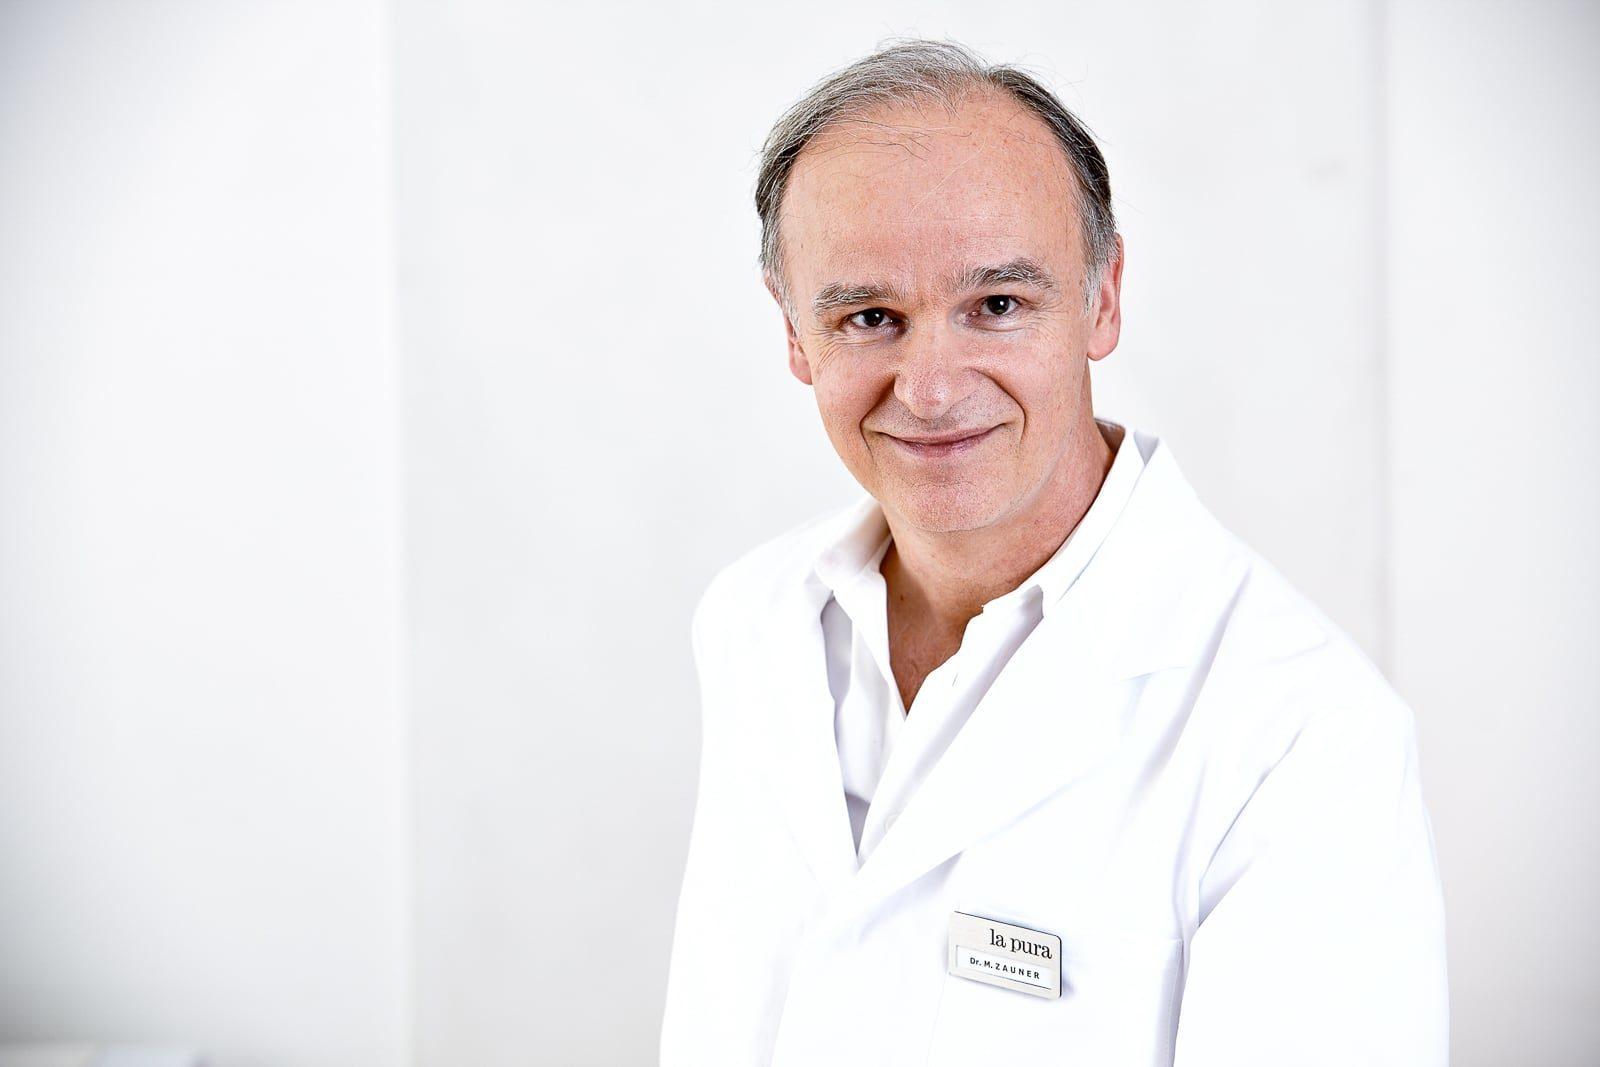 Portätbild Dr. Zauner